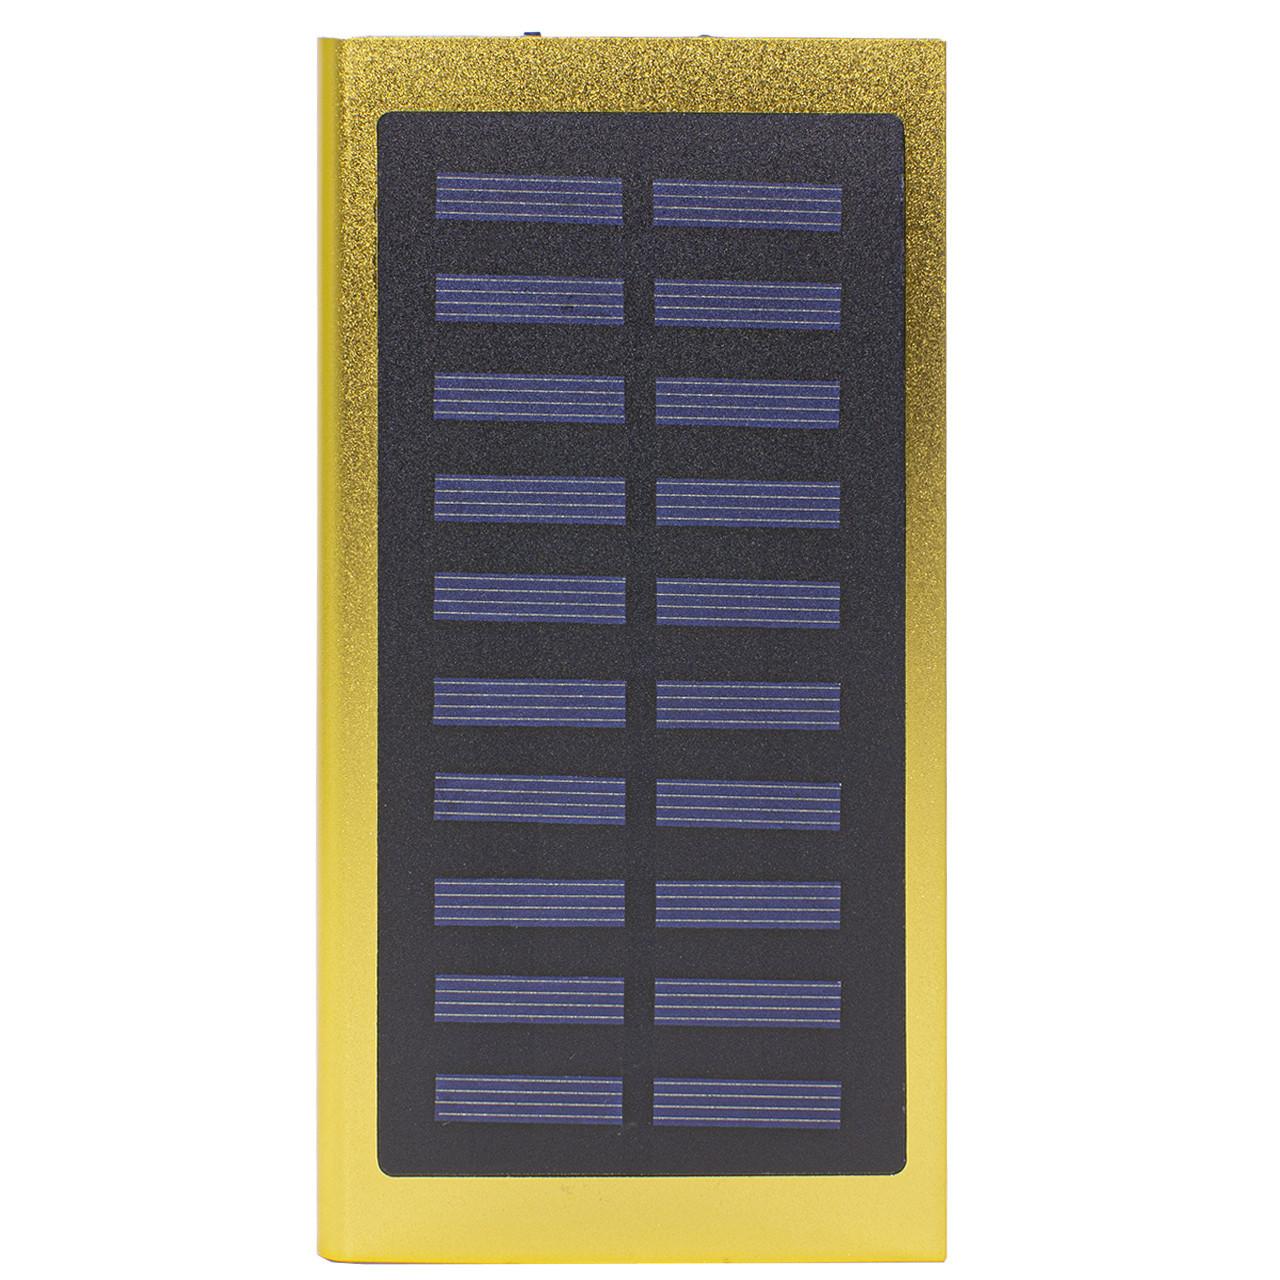 Внешний аккумулятор Cube Solar Water 20000 mAh Gold (258-10381)